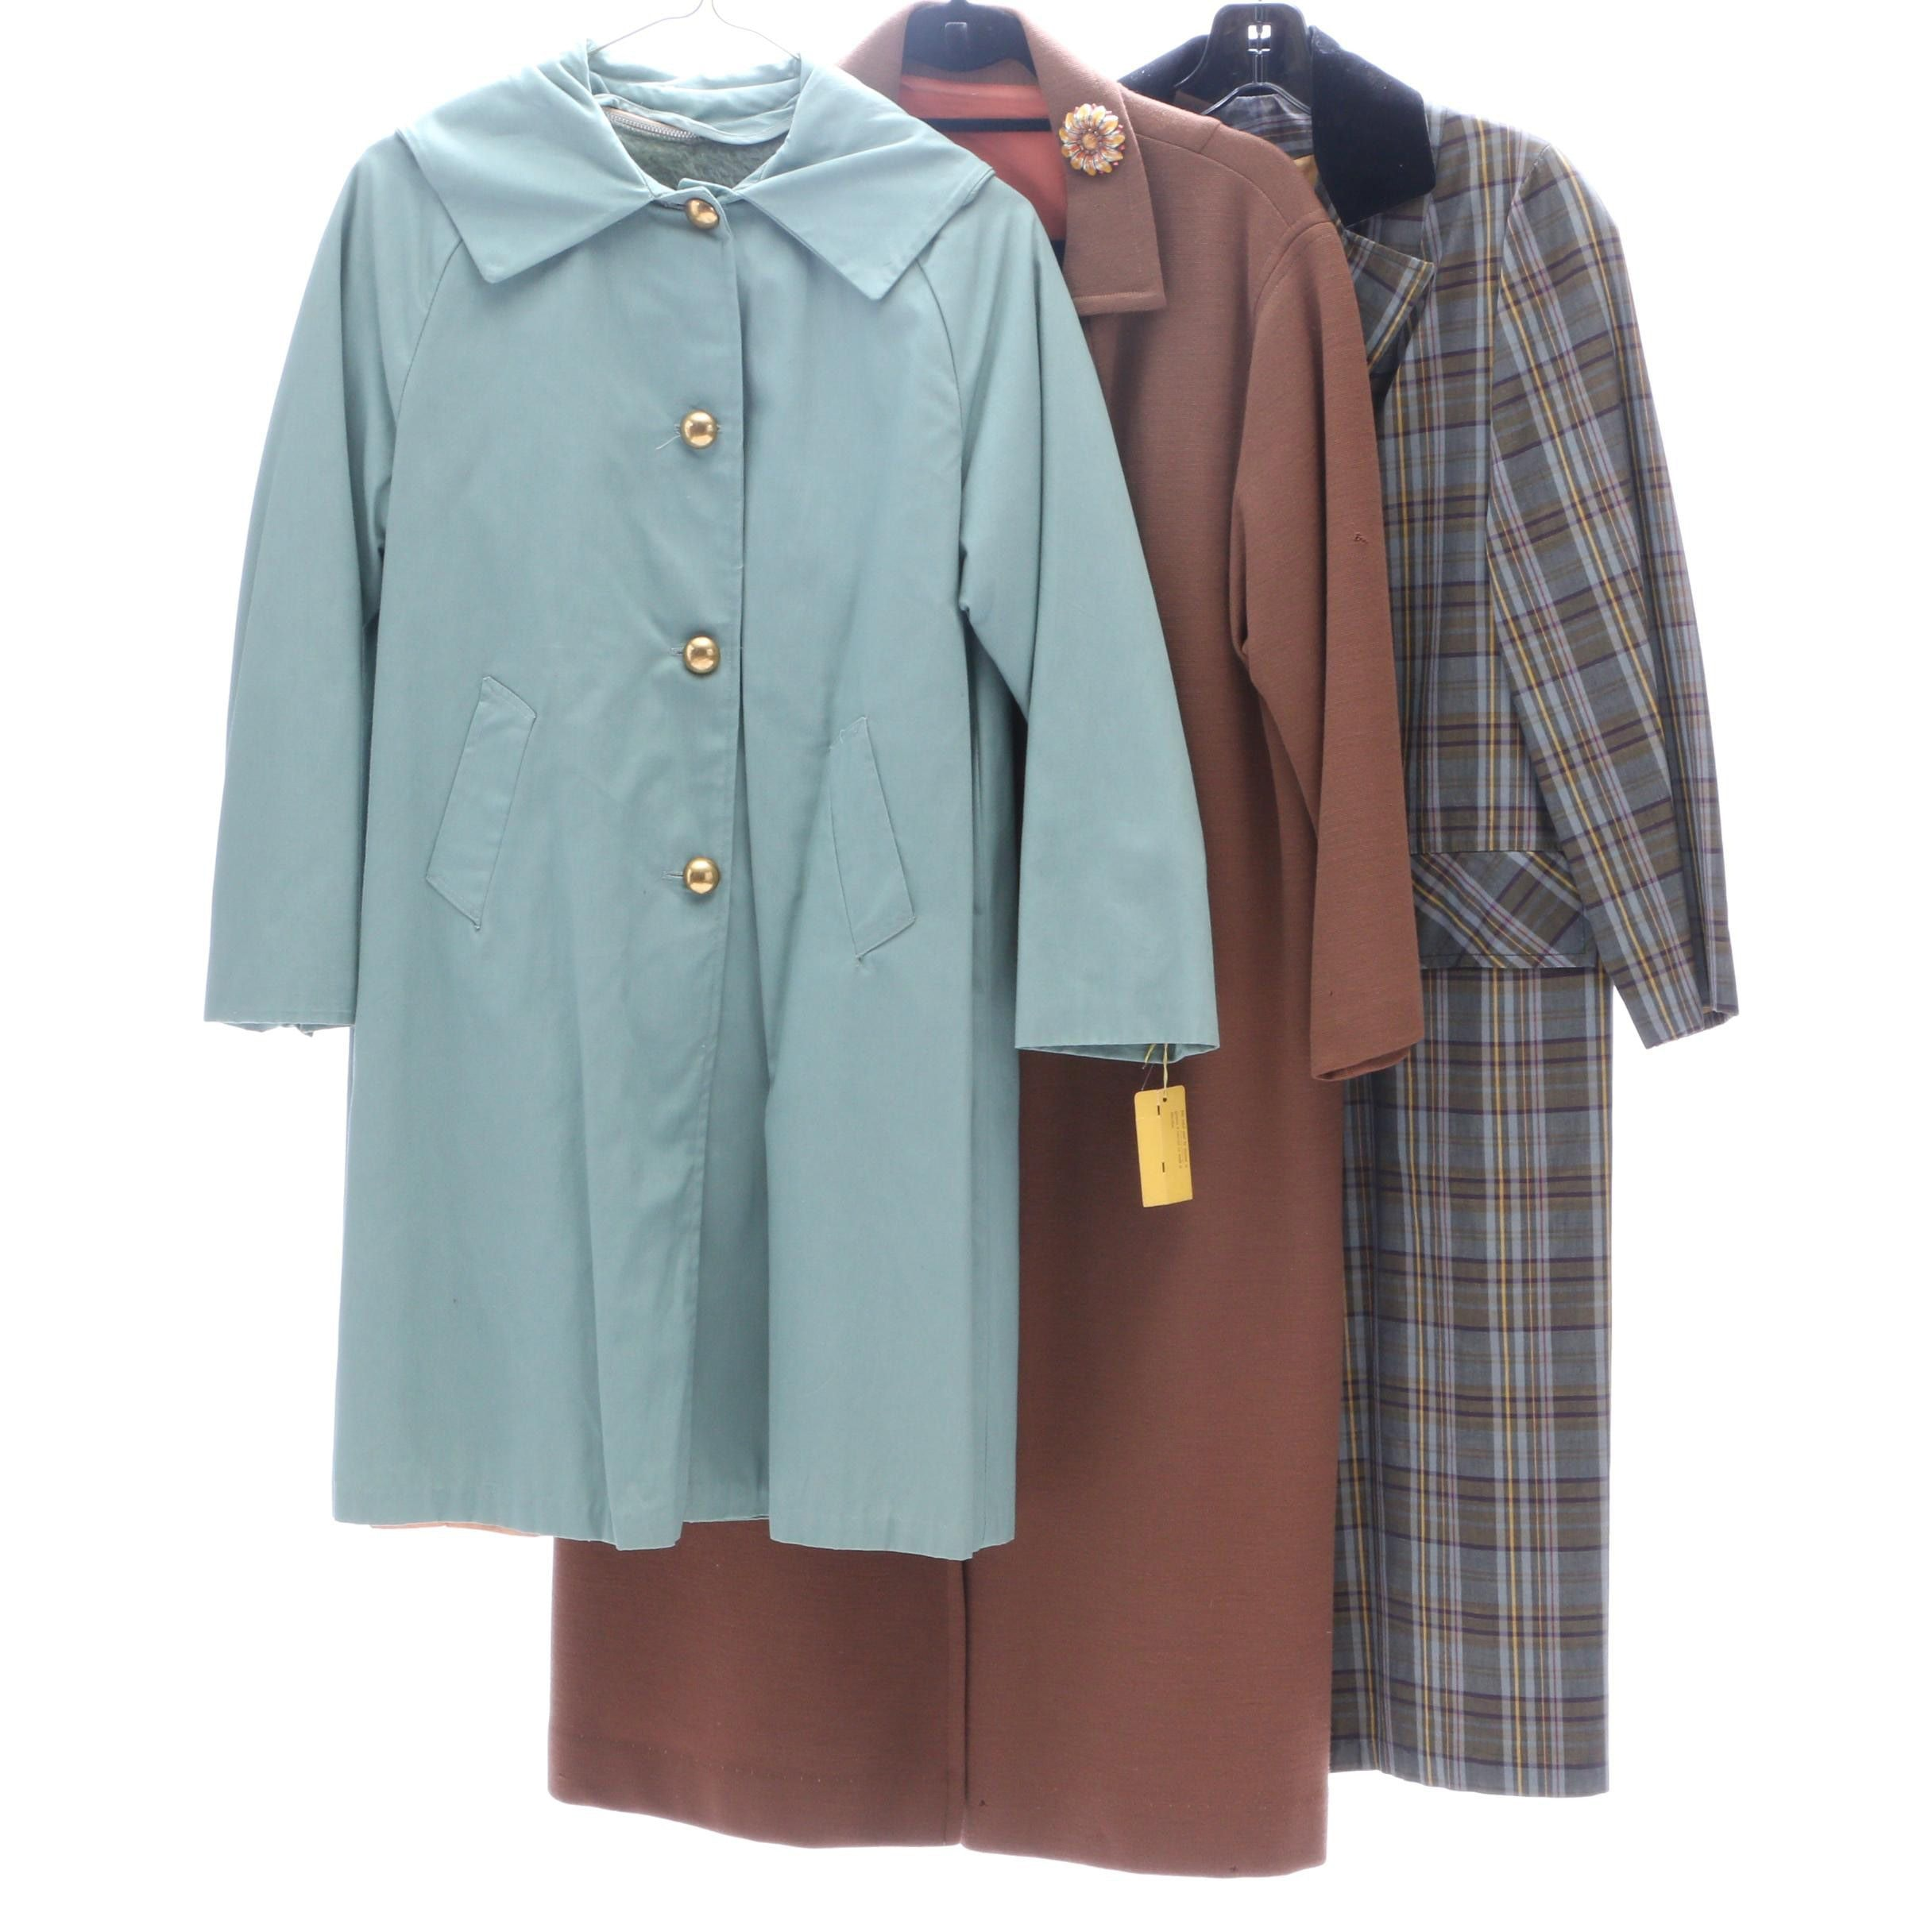 Women's Circa 1960s Vintage Jackets